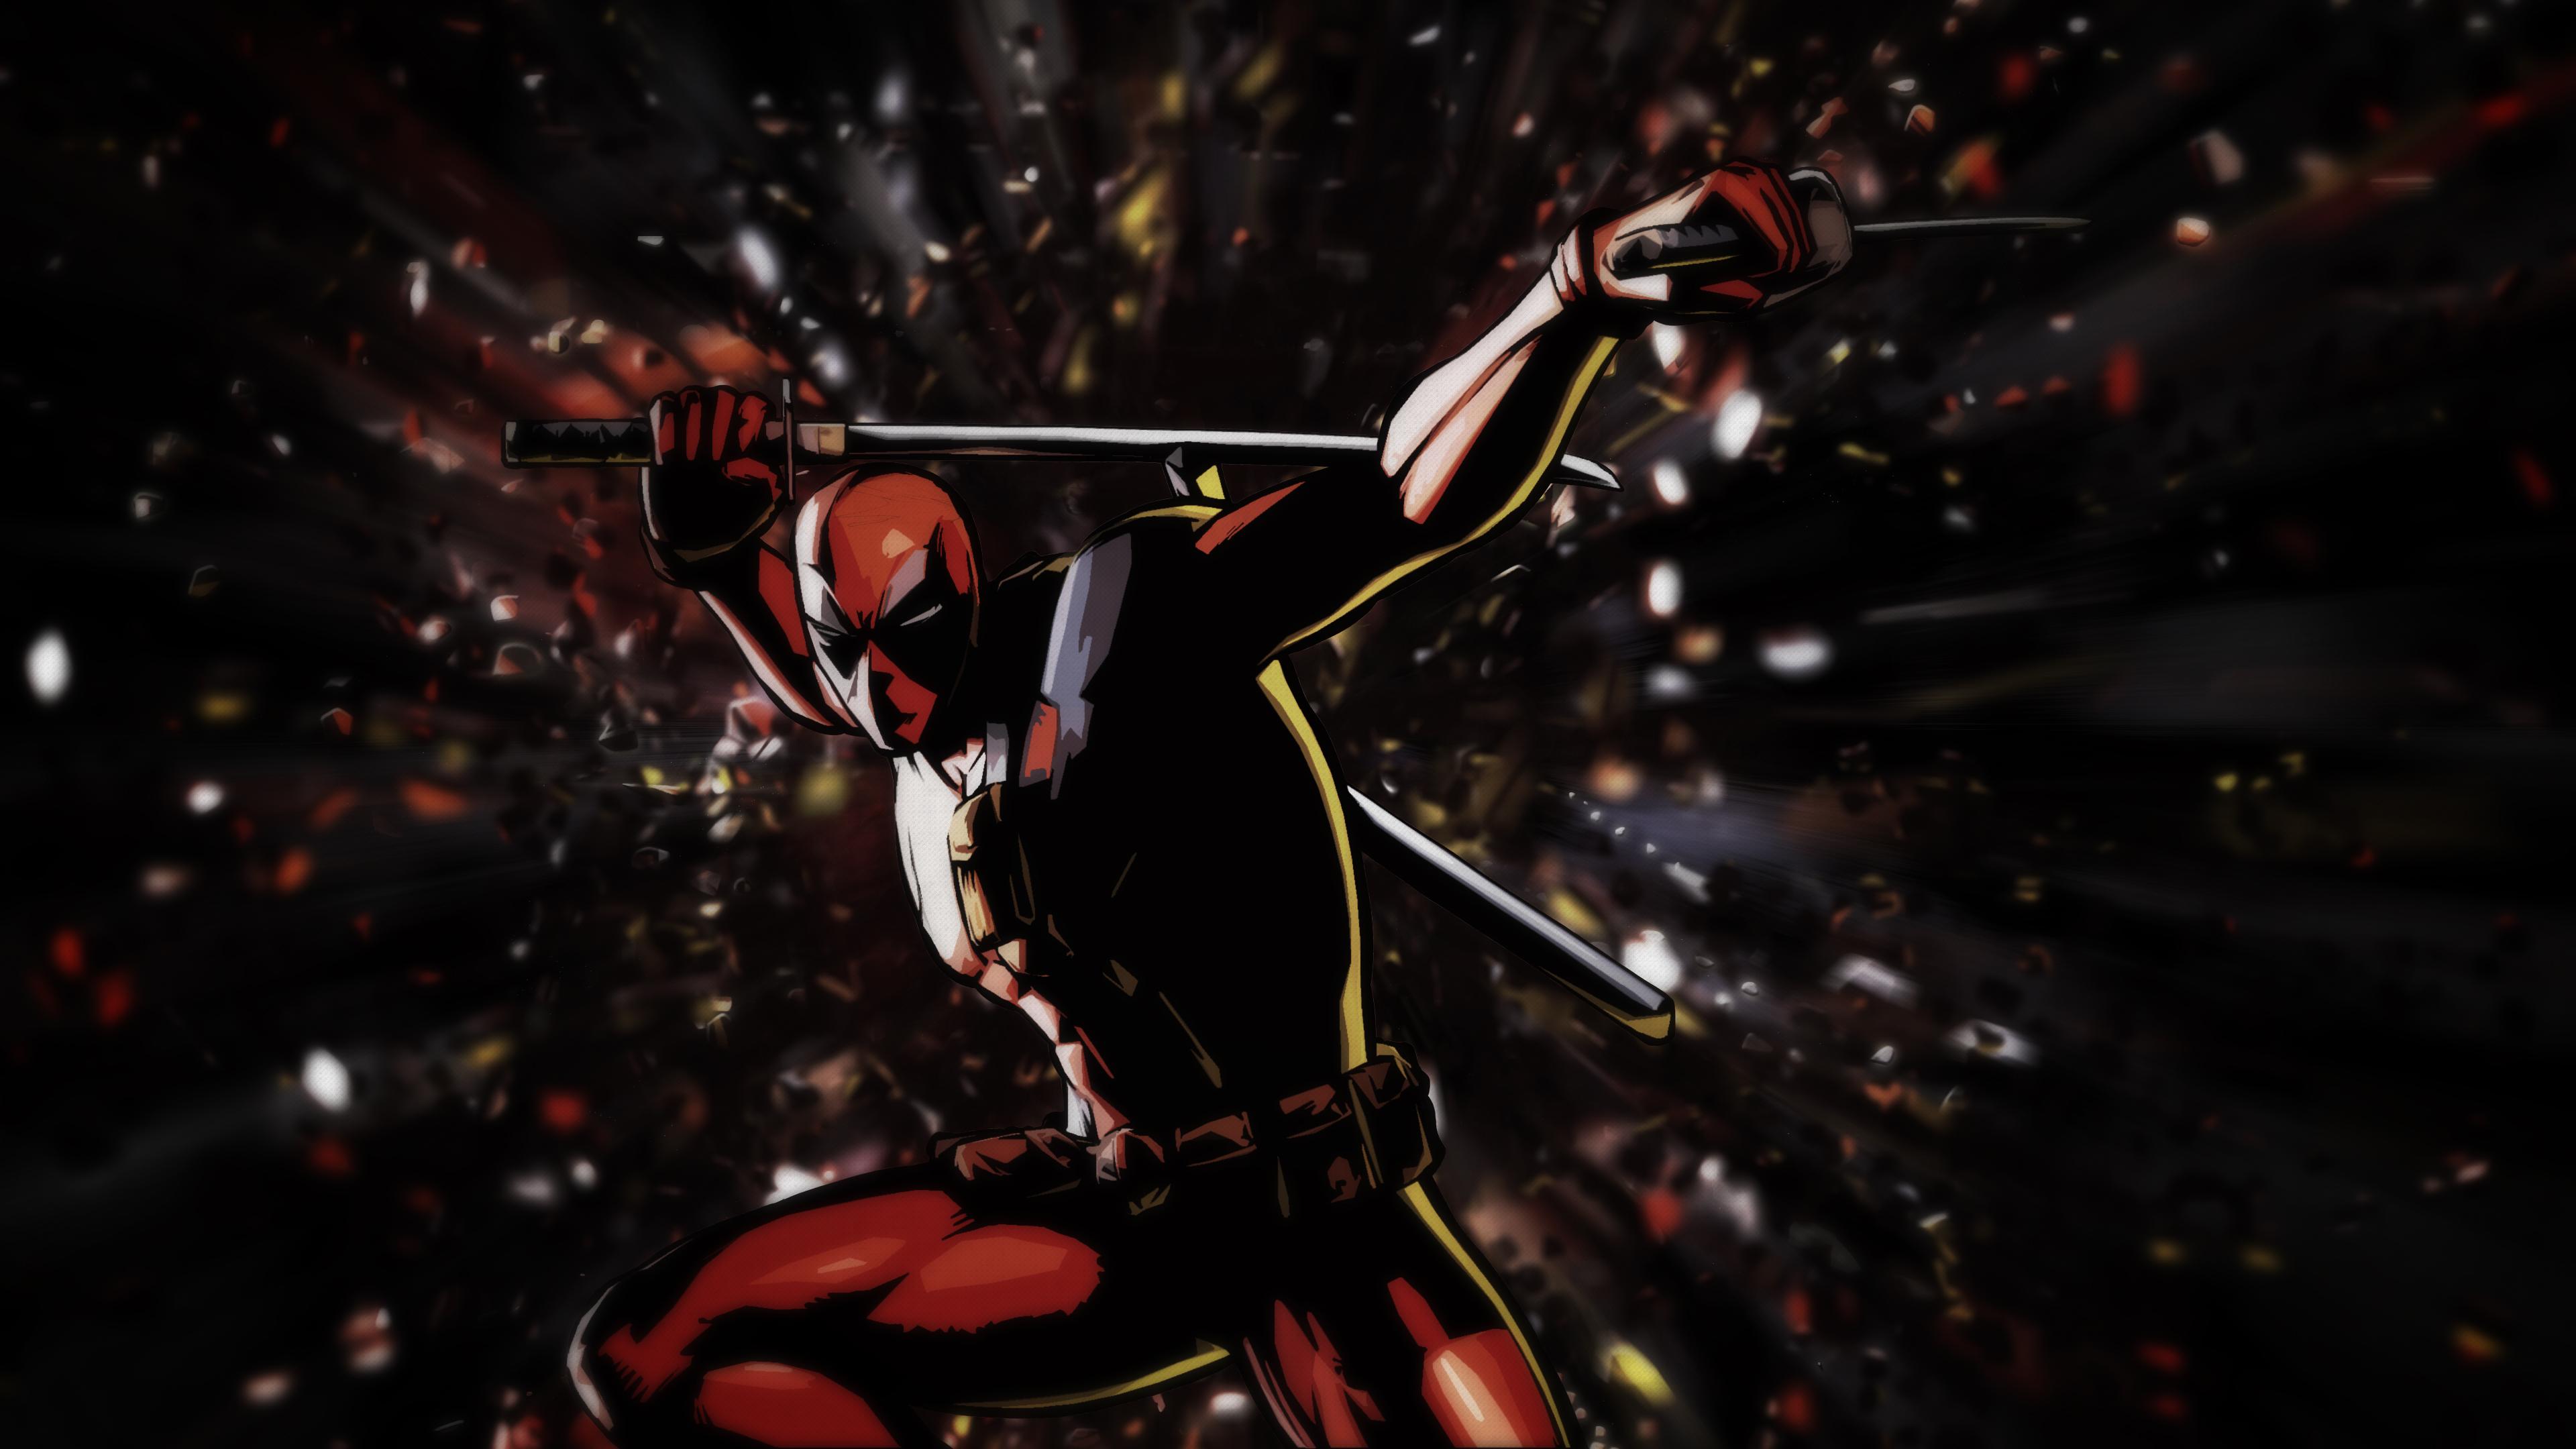 deadpool art 4k 1536521845 - Deadpool Art 4k - superheroes wallpapers, hd-wallpapers, digital art wallpapers, deadpool wallpapers, artwork wallpapers, 4k-wallpapers